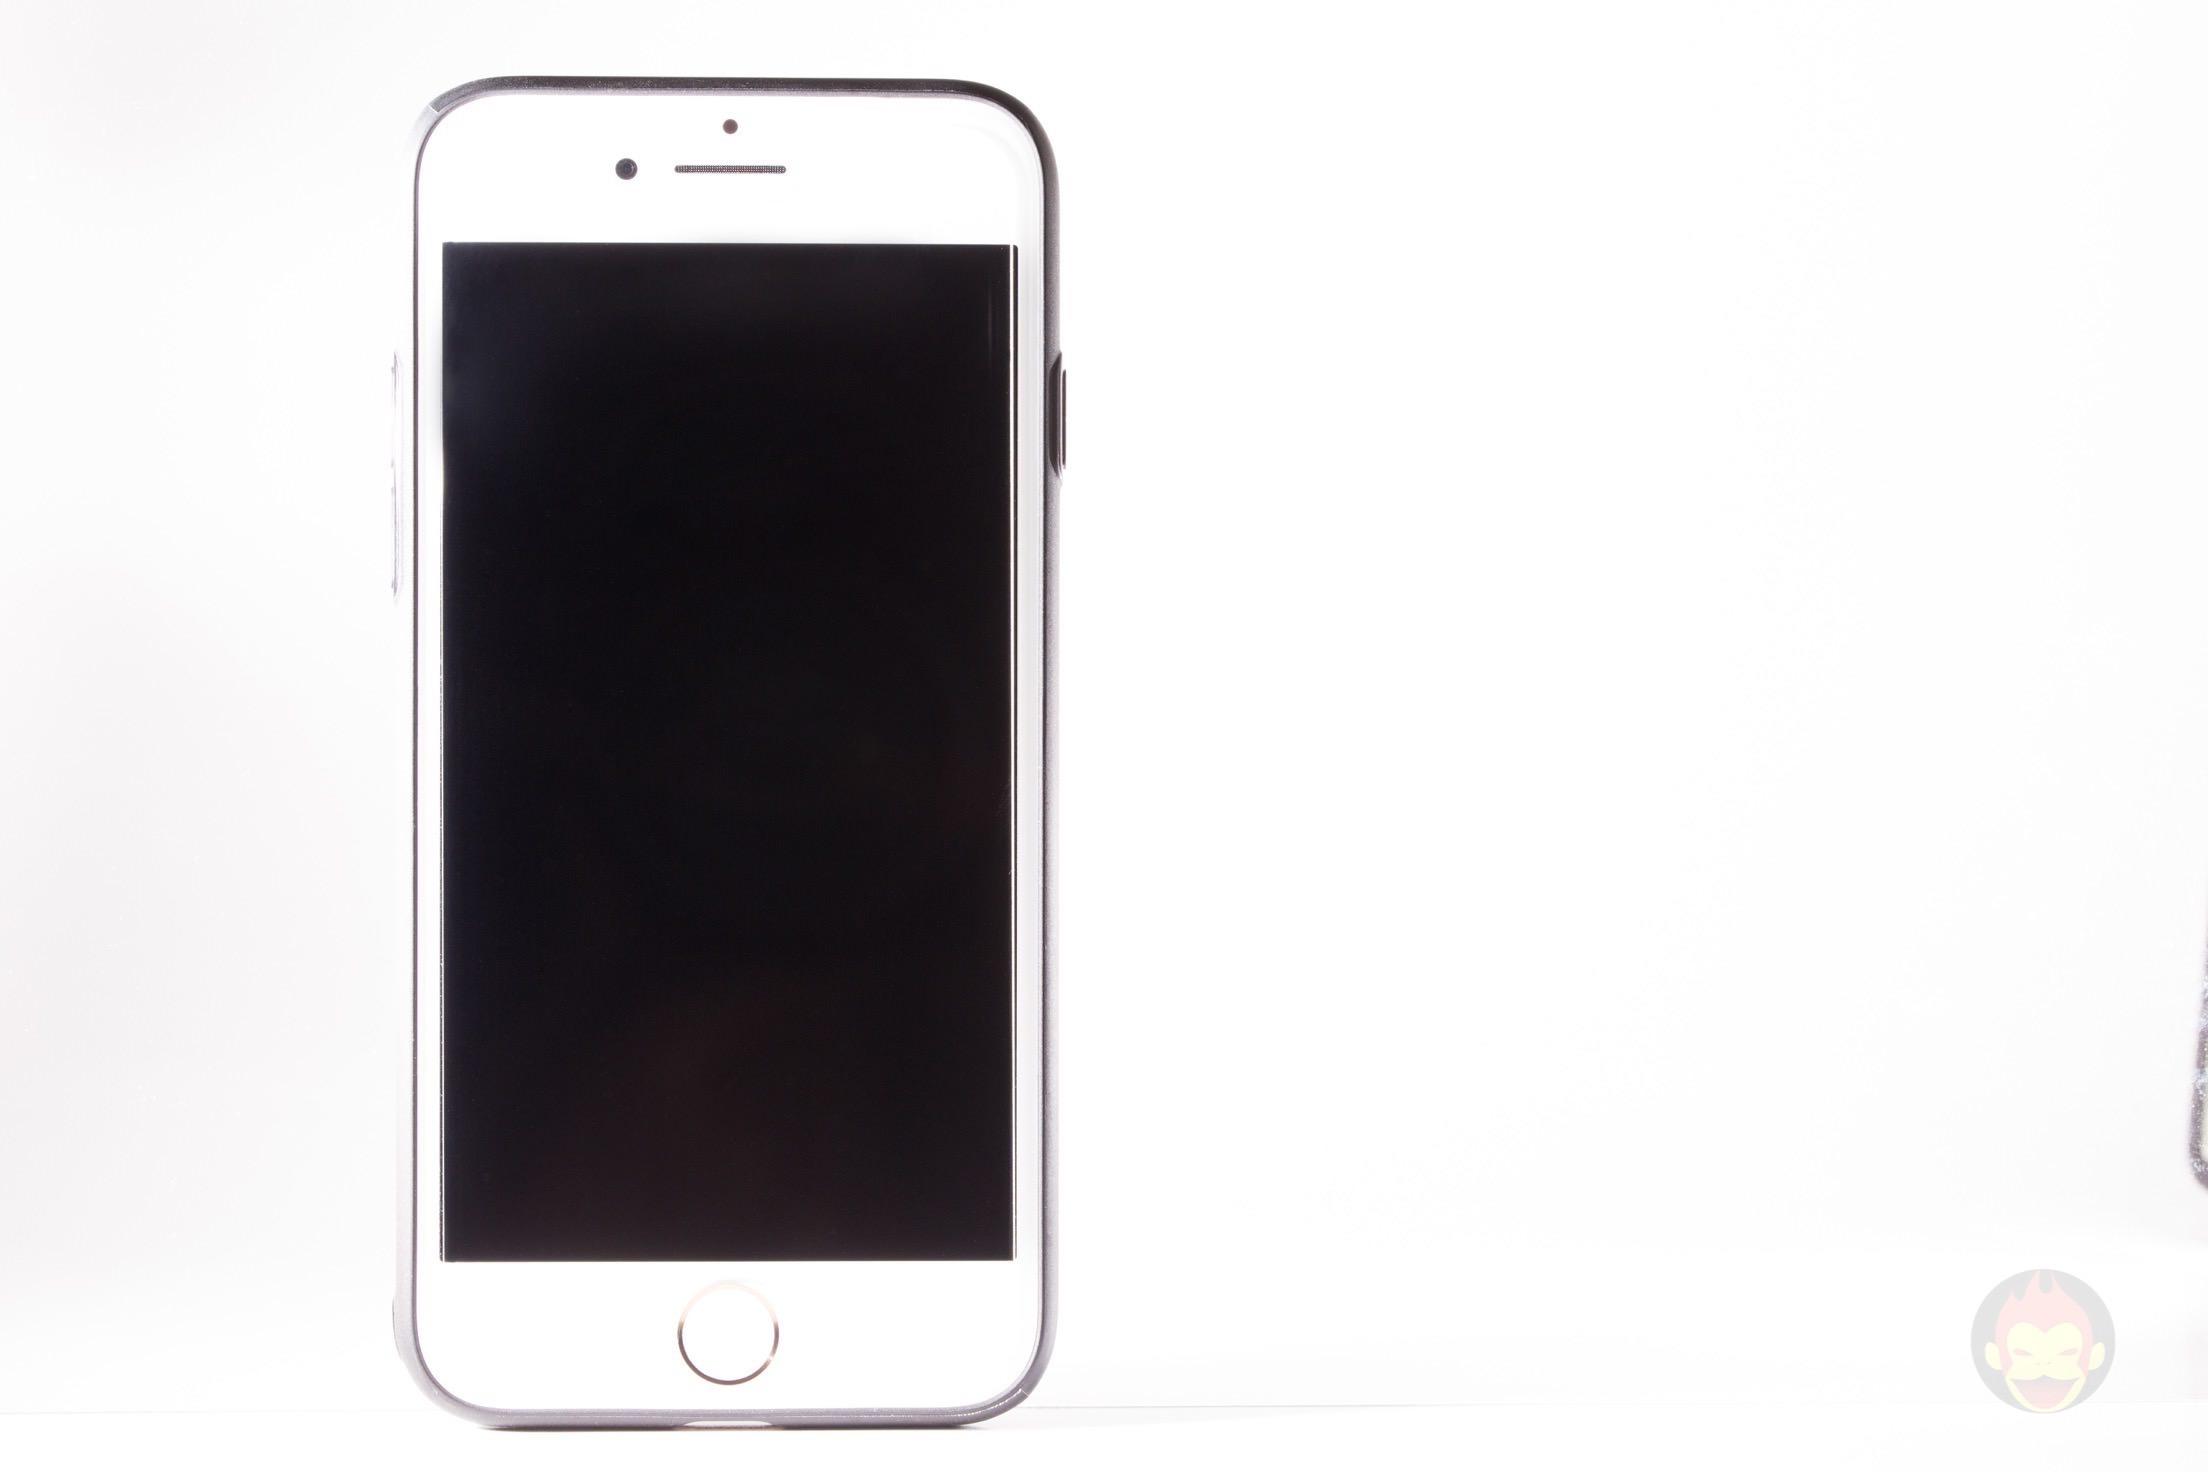 iPhone-7-Gold-Model-01.jpg